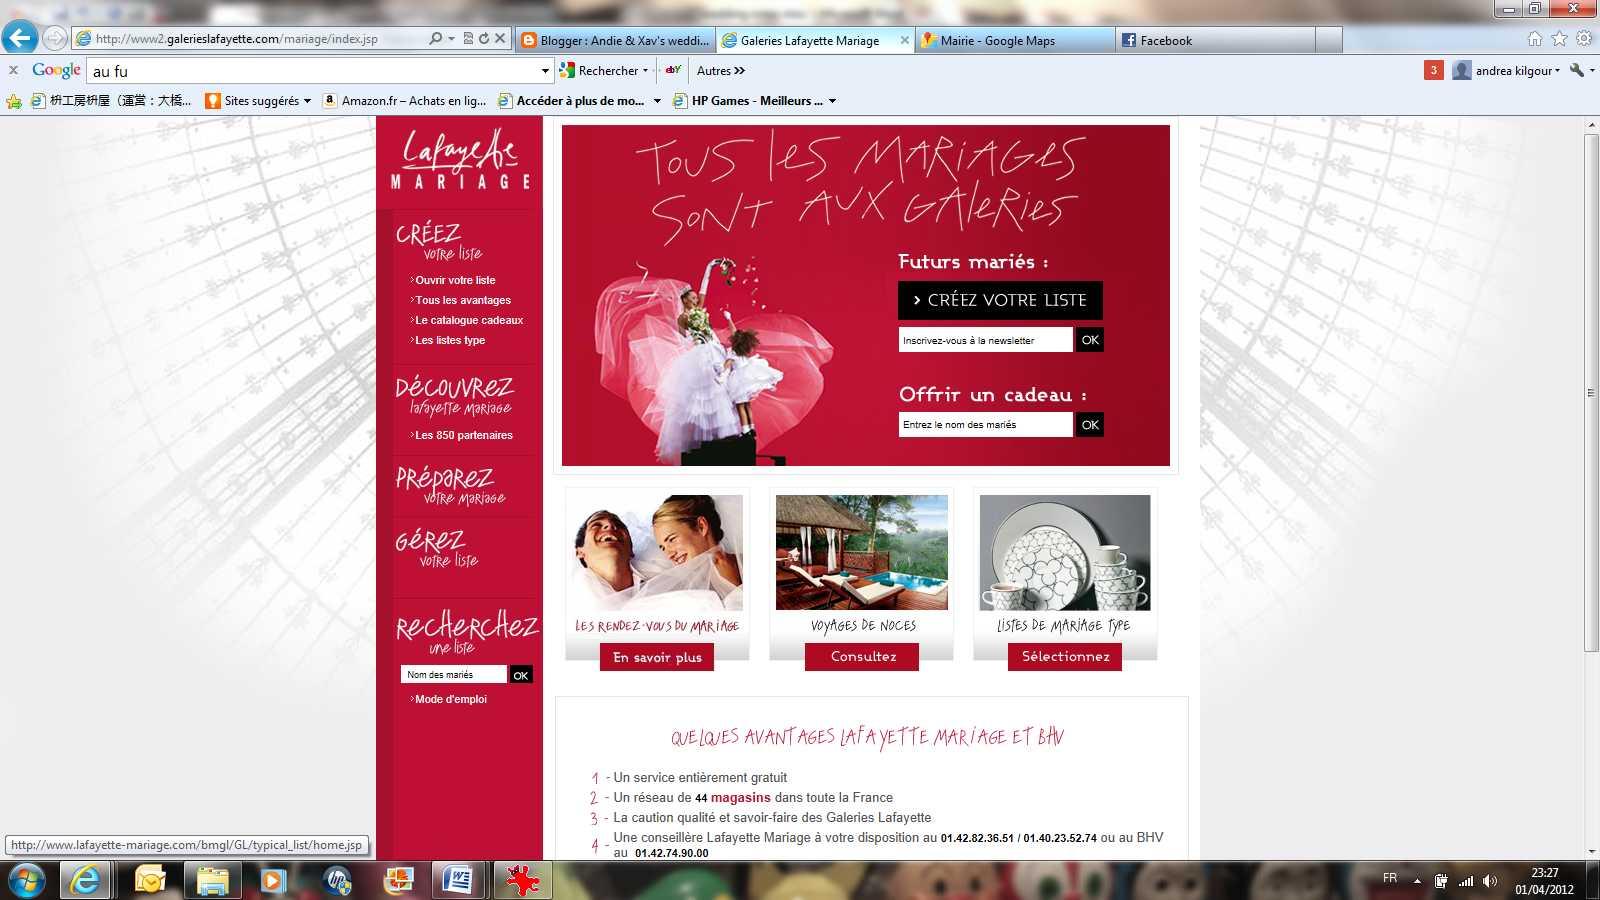 Andie xav 39 s wedding blog wedding registry notre liste de marriage - Liste de mariage galeries lafayettes ...